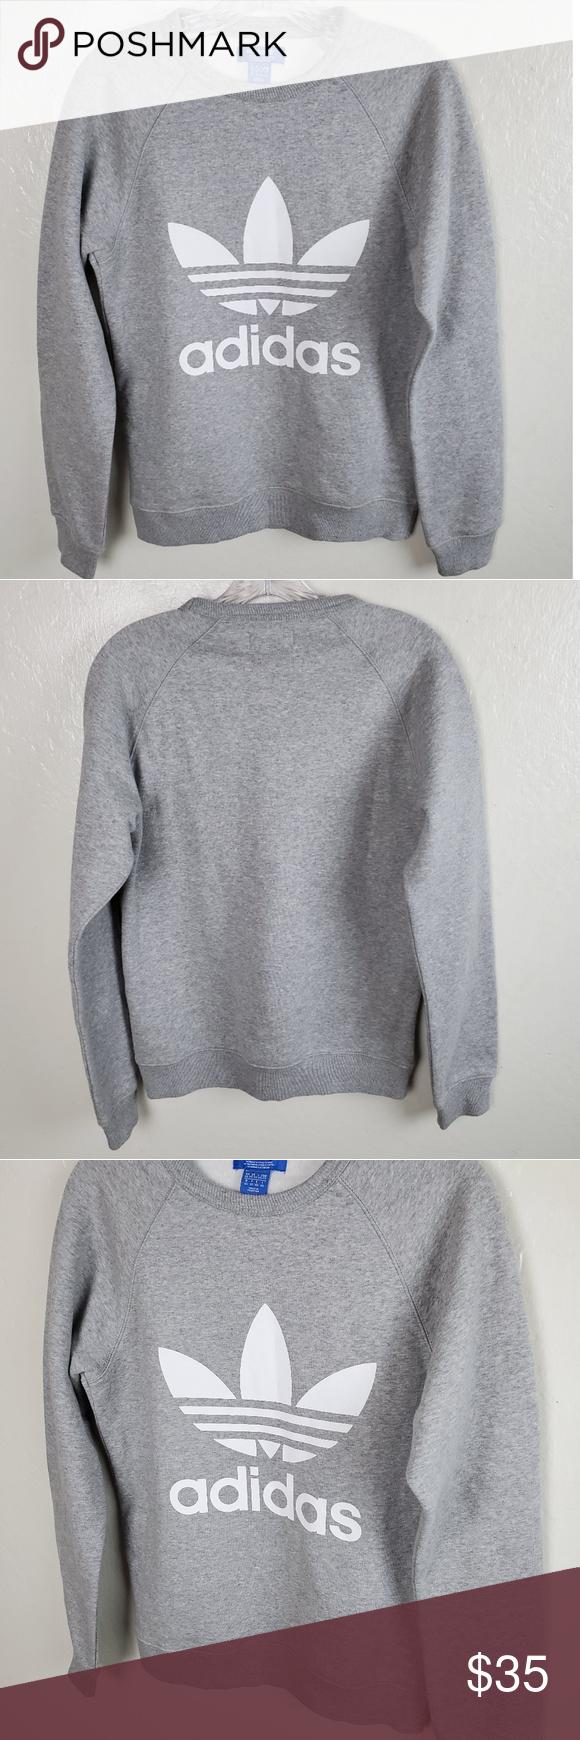 Adidas Original Trefoil Crewneck Sweatshirt Xs Crew Neck Sweatshirt Sweatshirts Adidas Sweater [ 1740 x 580 Pixel ]